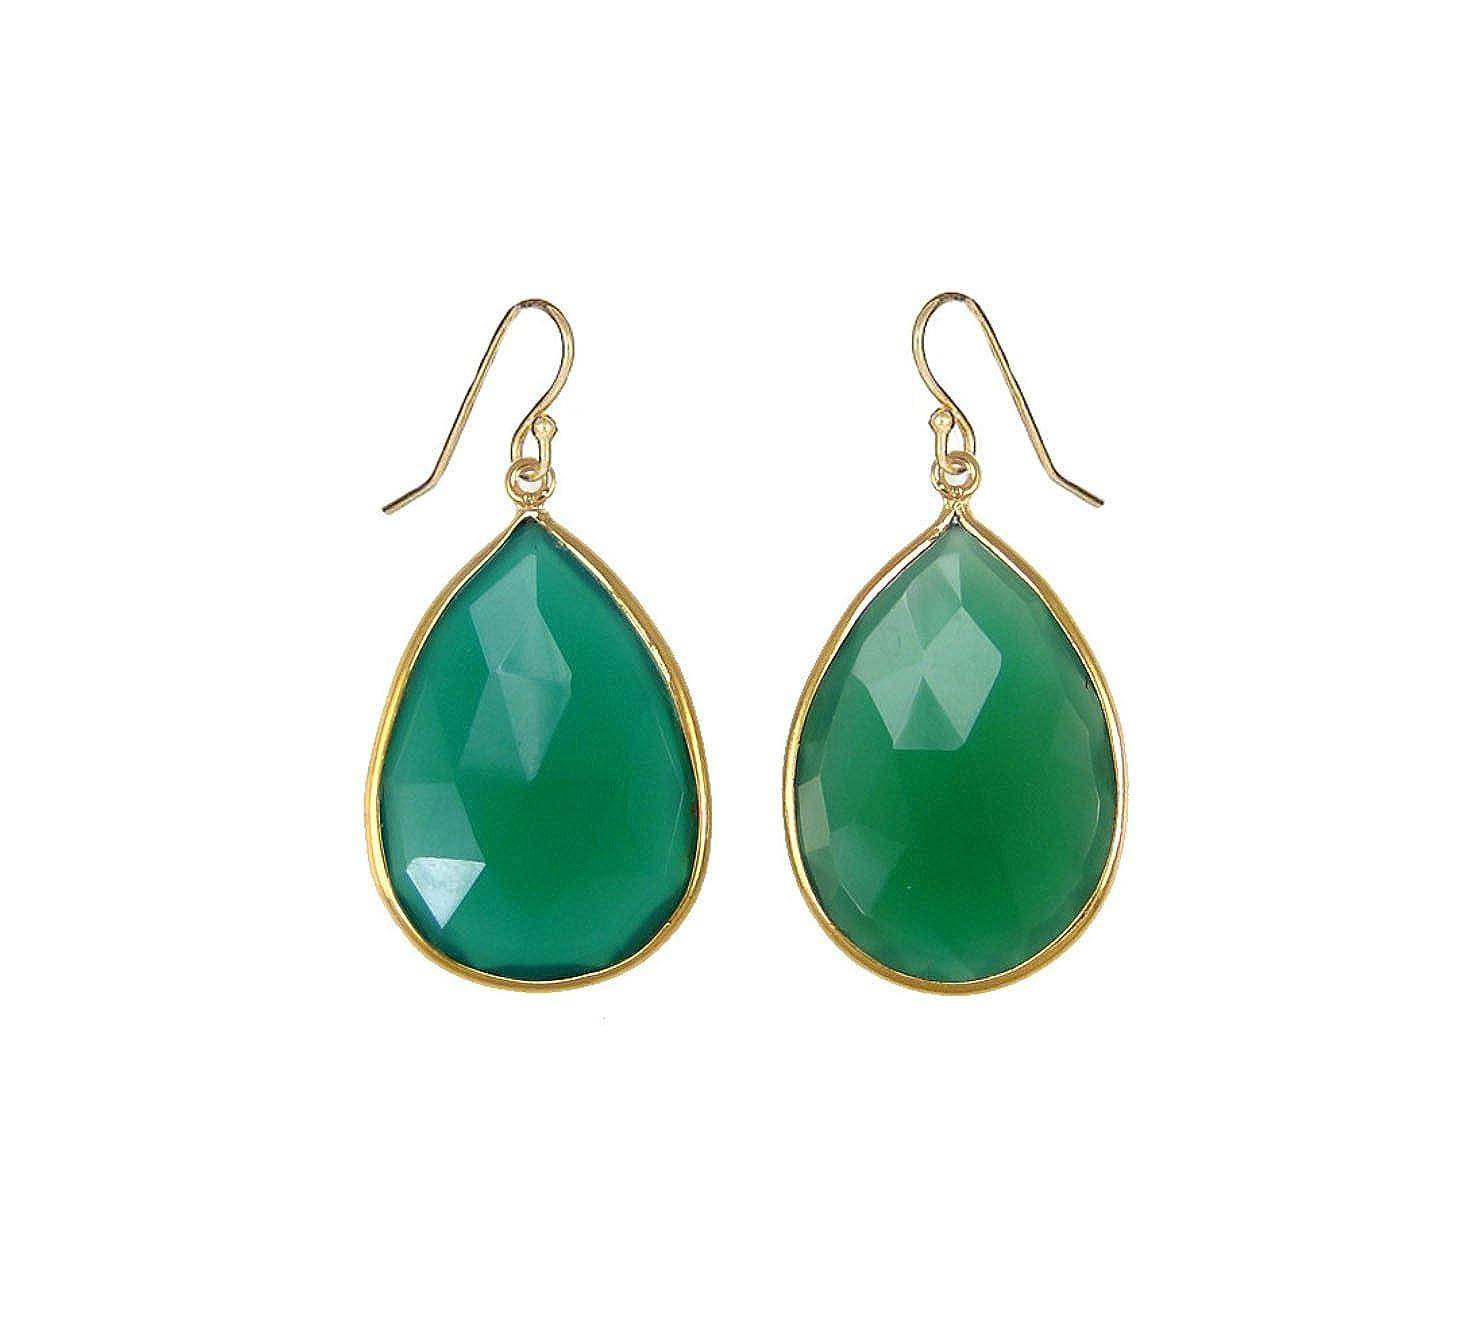 SPARKLER JEWELS Green Onyx Pear,Gold Plated,925 Sterling Silver,Dangle Earrings,Handmade Earrings